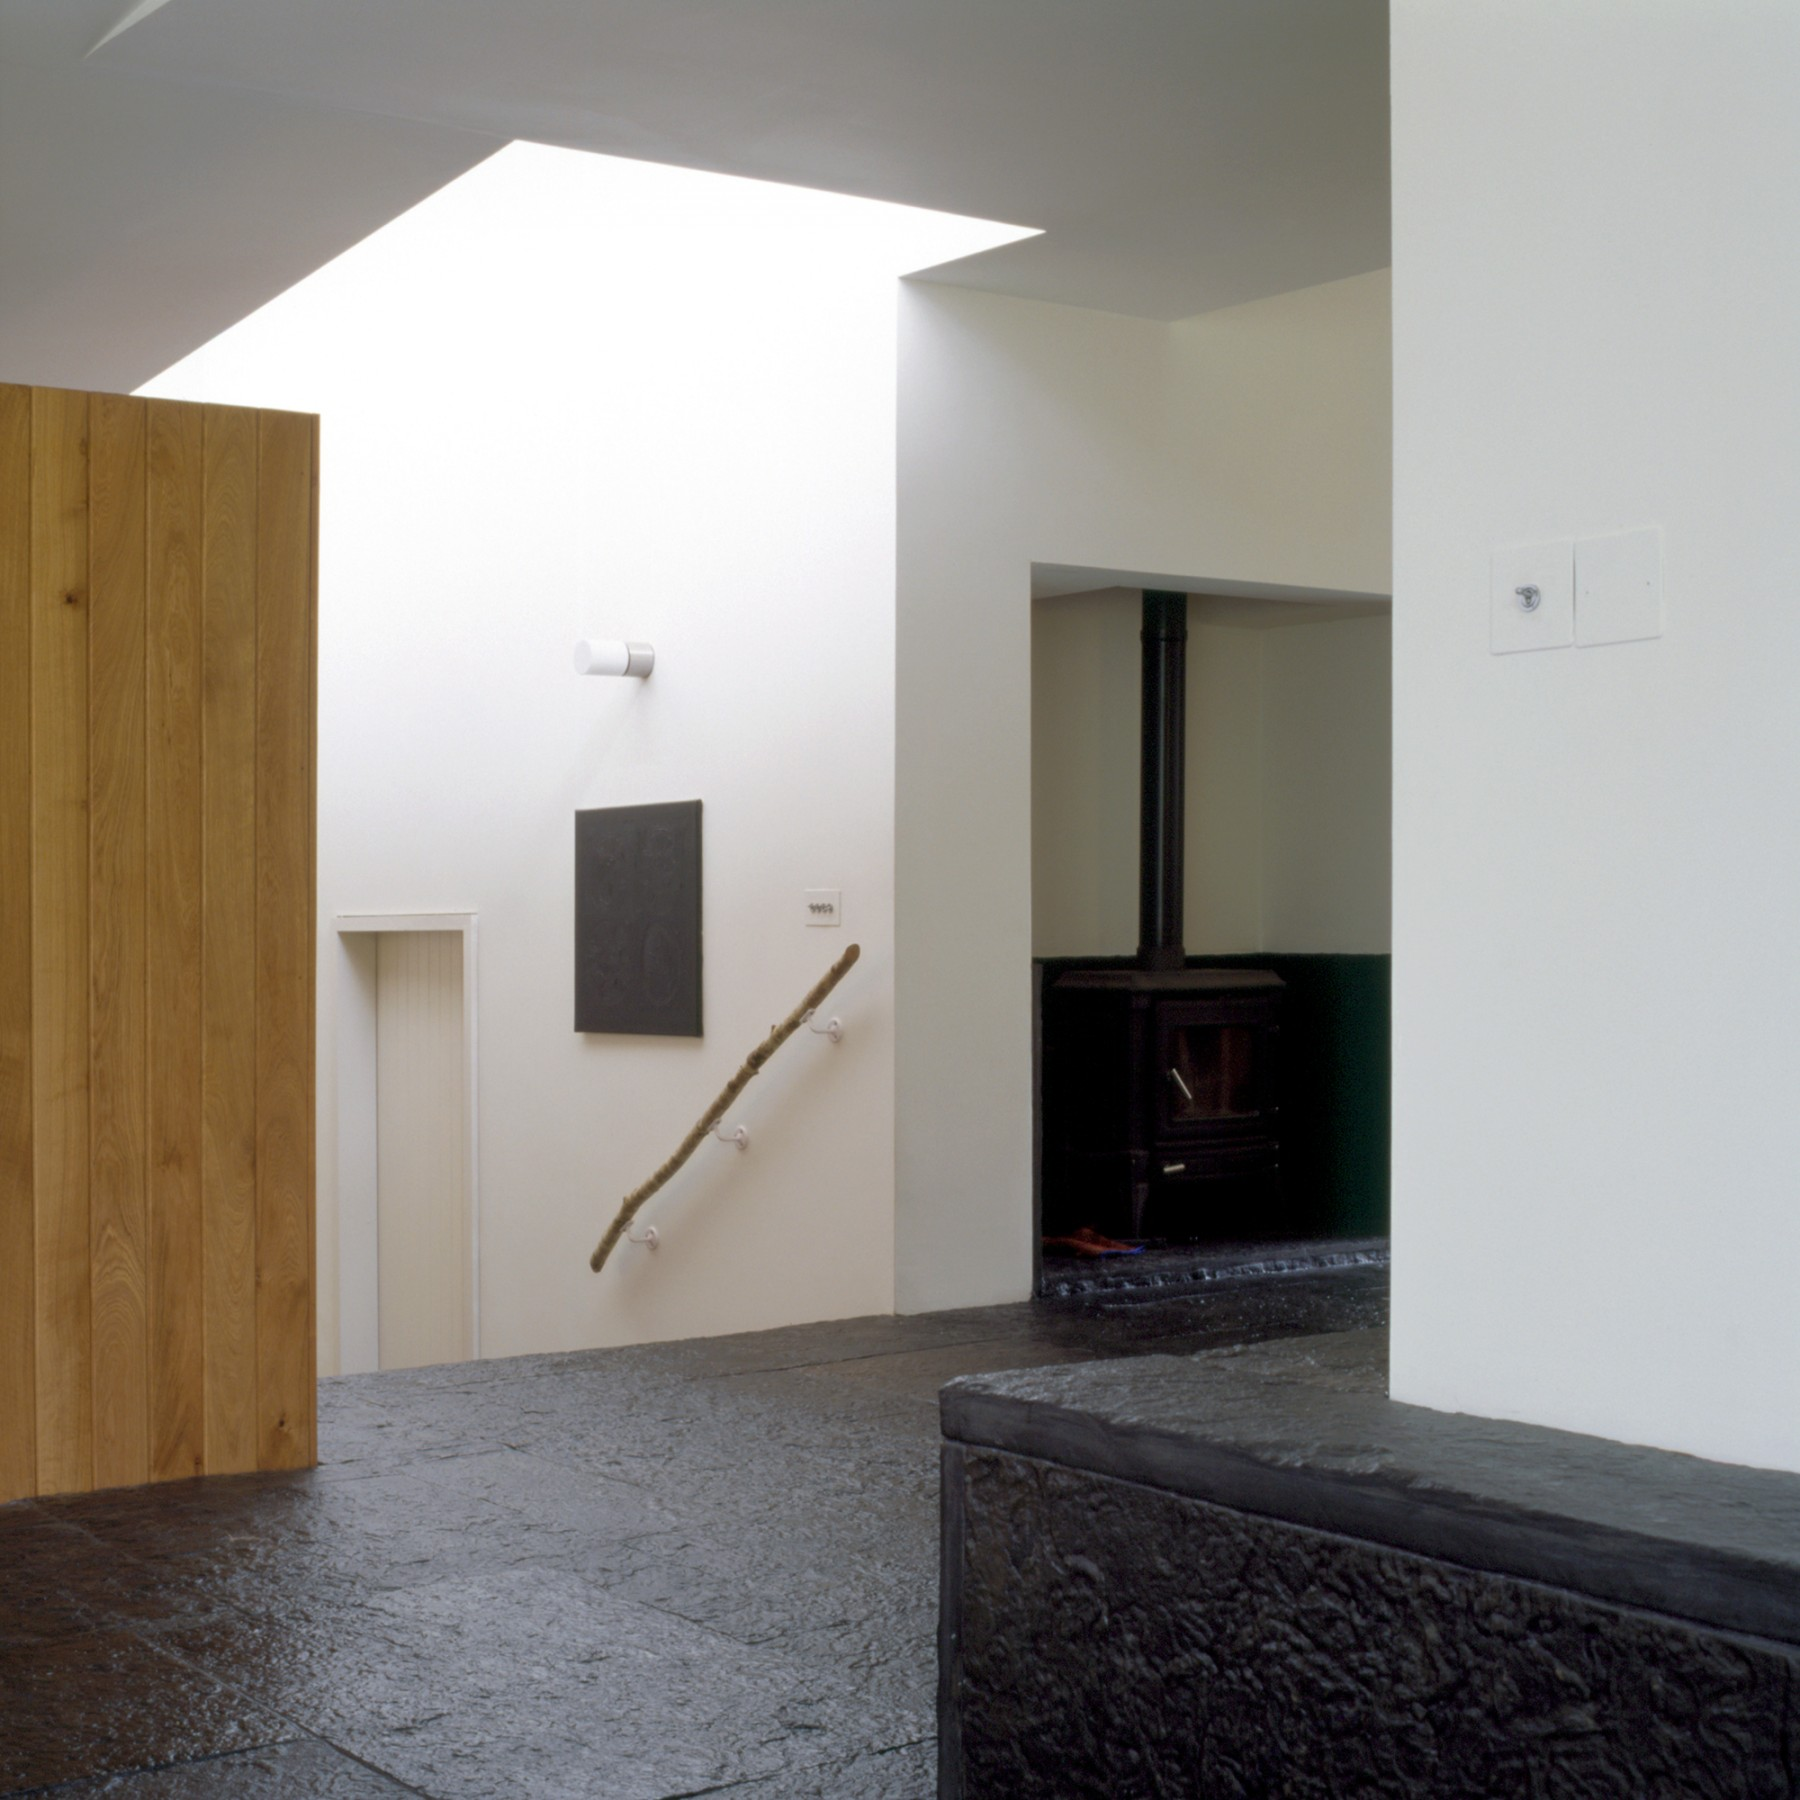 FaHa-Farm-house-barn-County-Clare-Ireland-residential-home-rural-timber-zinc-Jamie-Fobert-Architects-12